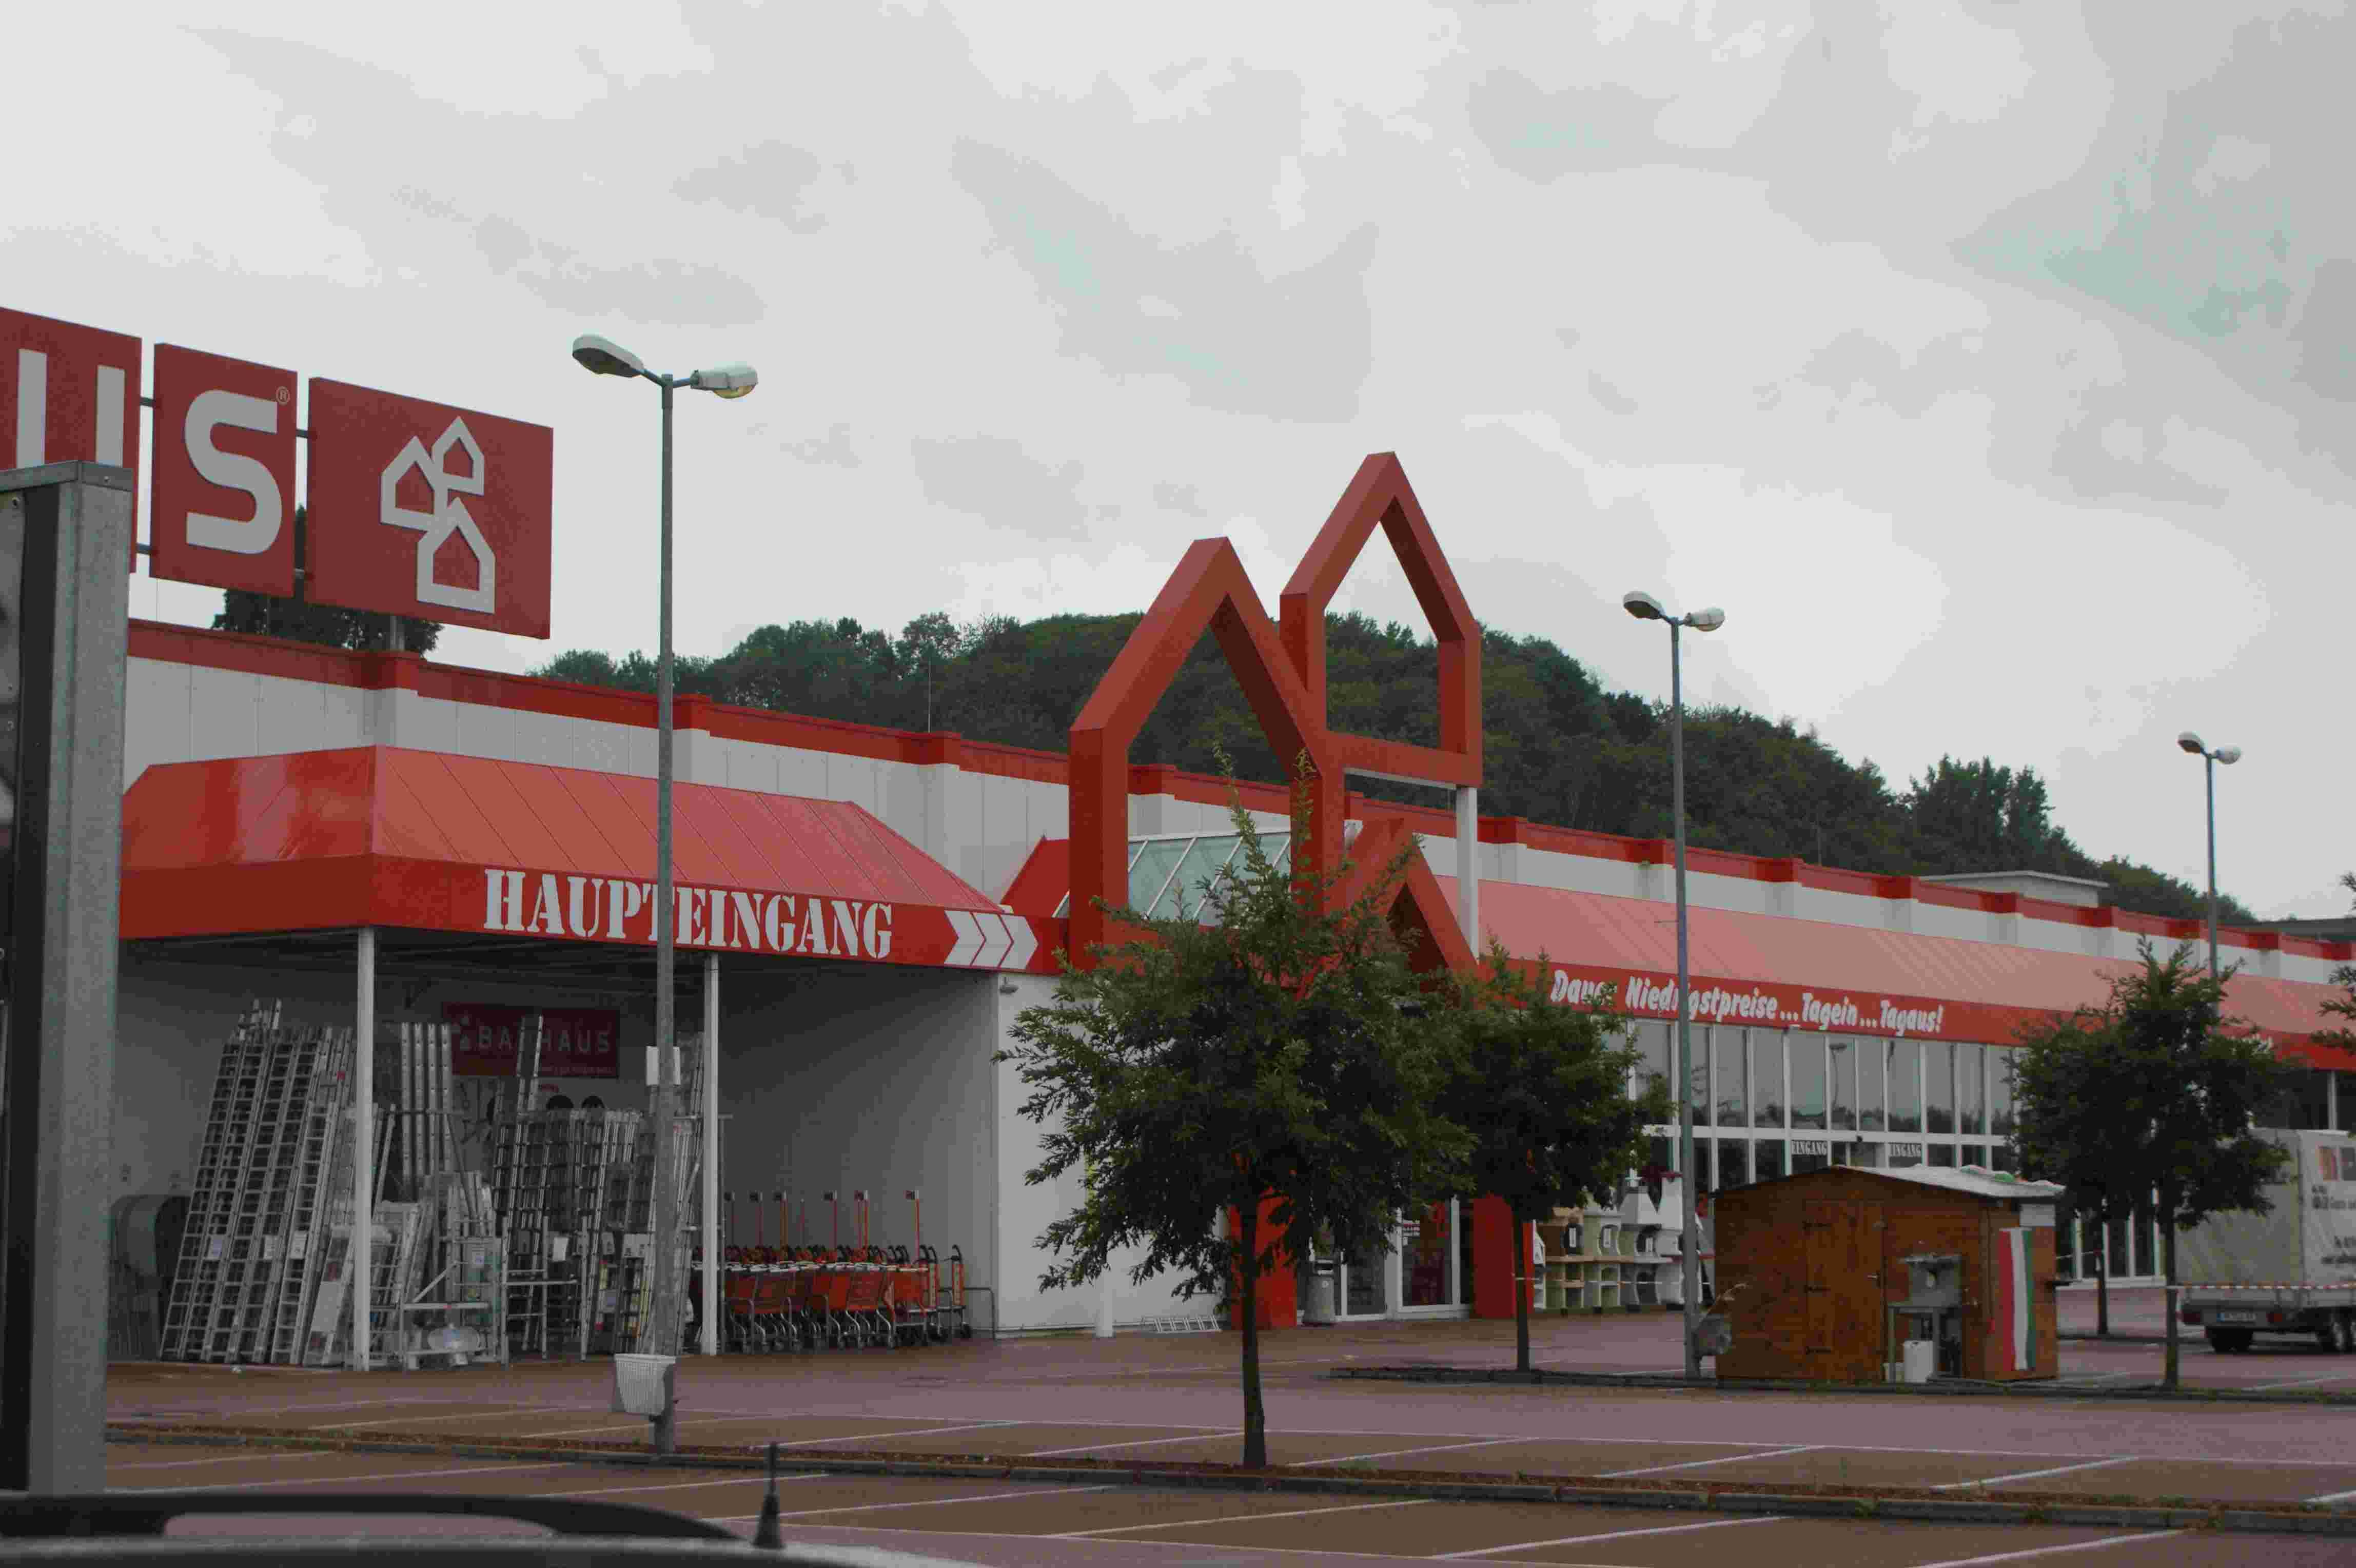 Bauhaus Gmbh Co Kg 75179 Pforzheim Wilferdinger Hohe